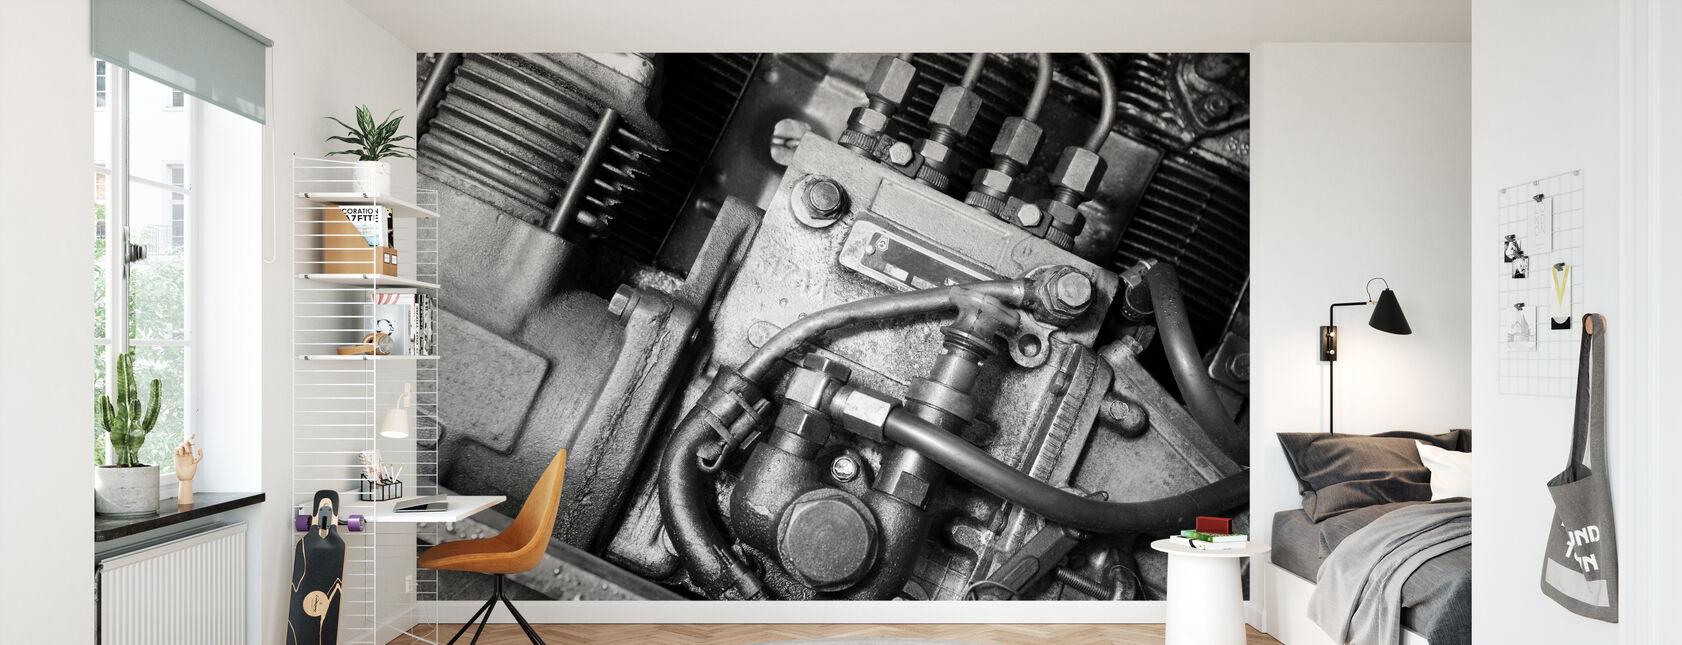 Car Engine - Monochrome - Wallpaper - Kids Room